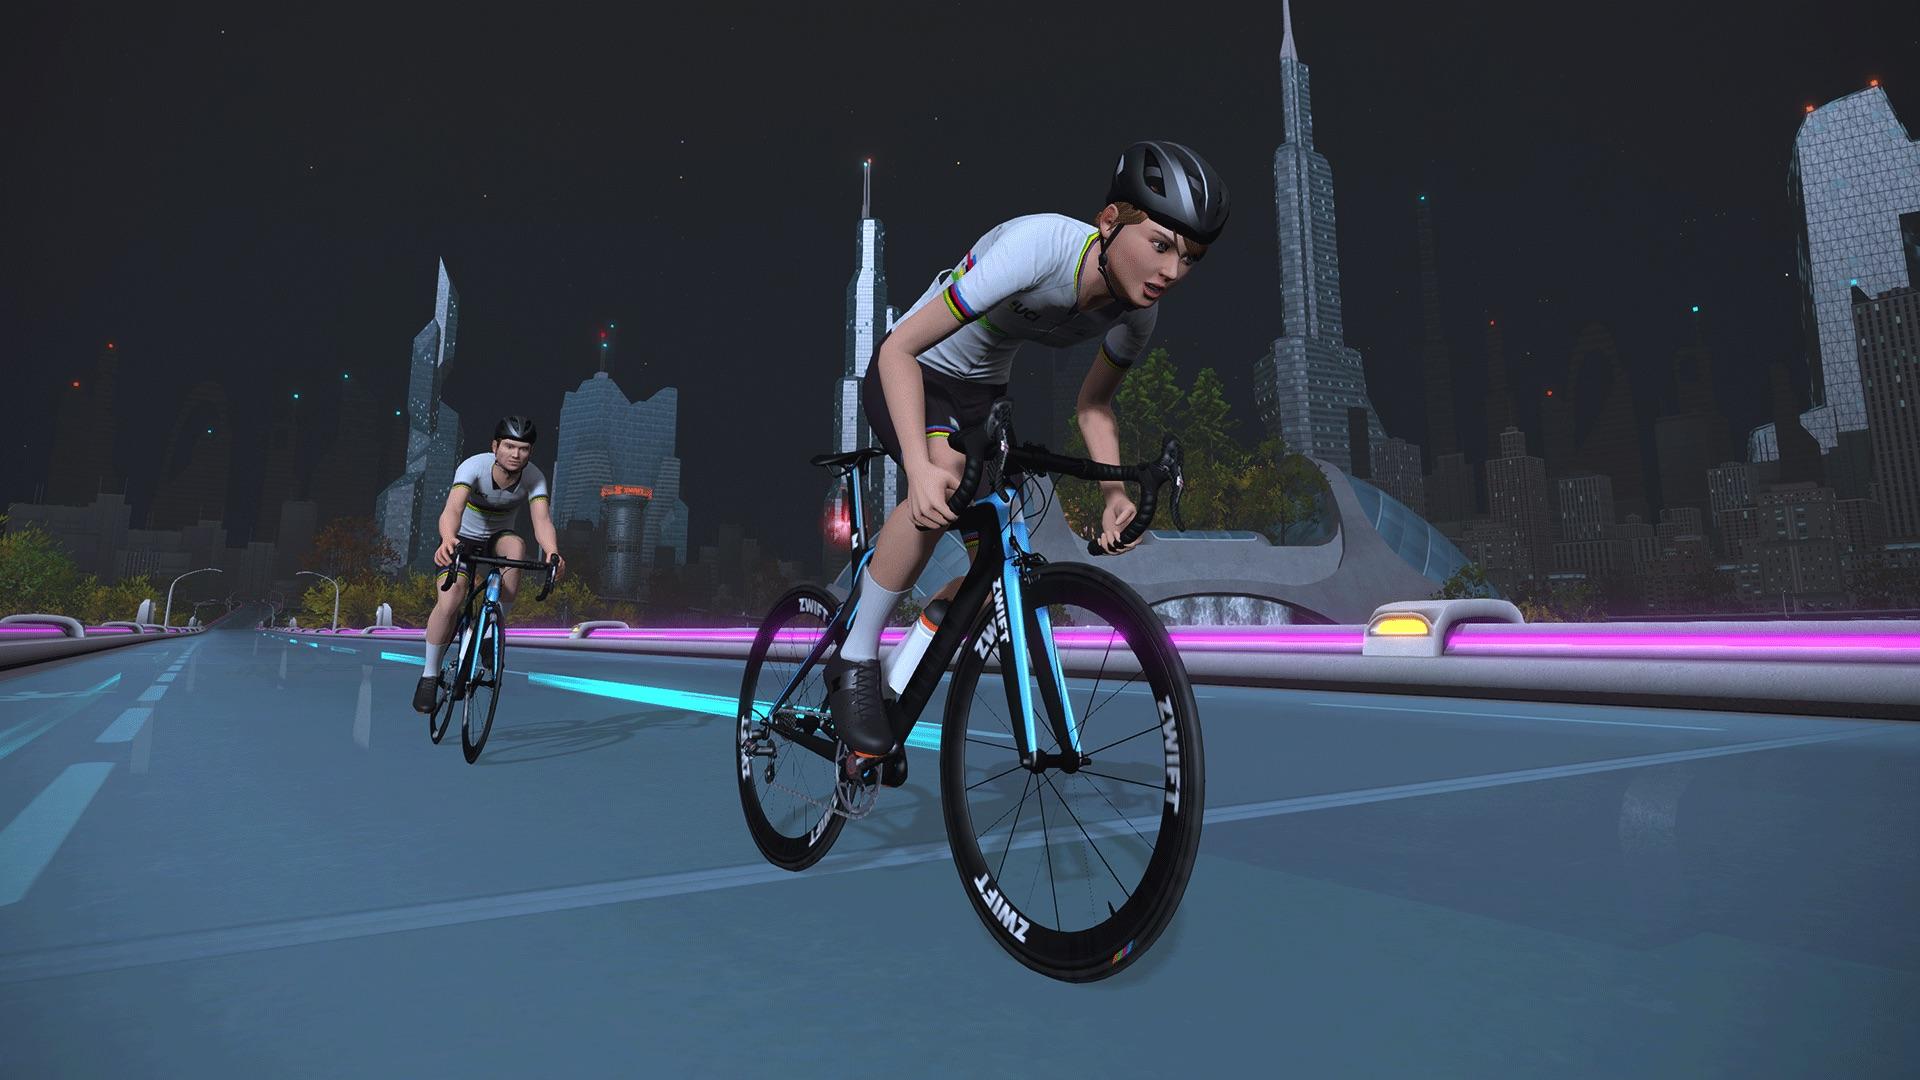 UCI_cycling_esports_announcement_knickerbocker_16x9_1